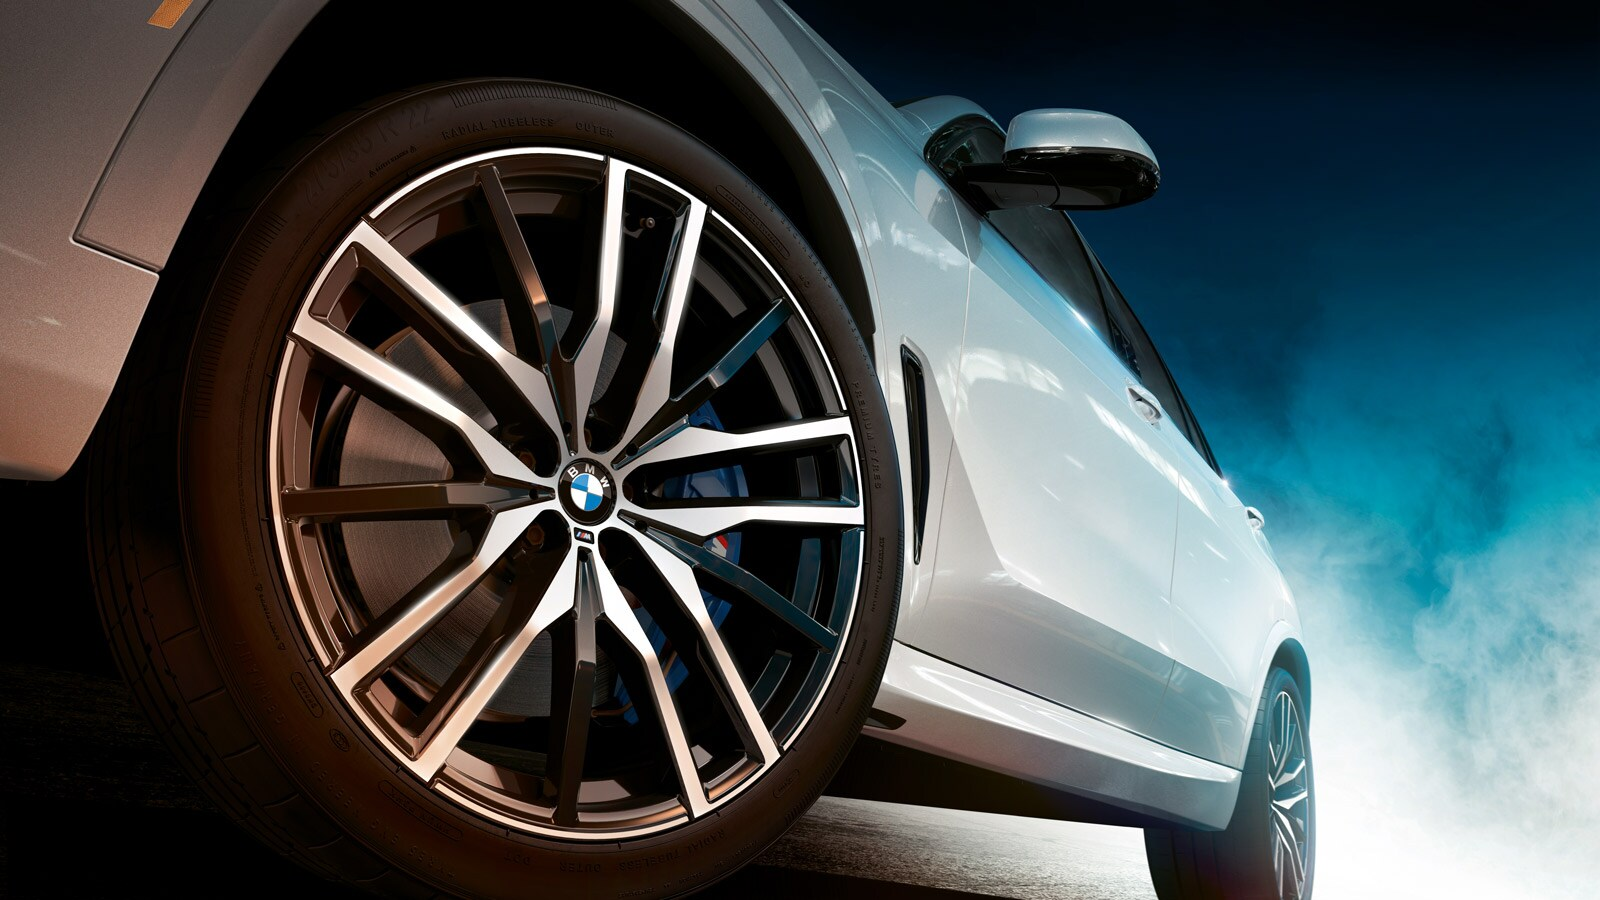 2020 BMW X5 Exterior Details